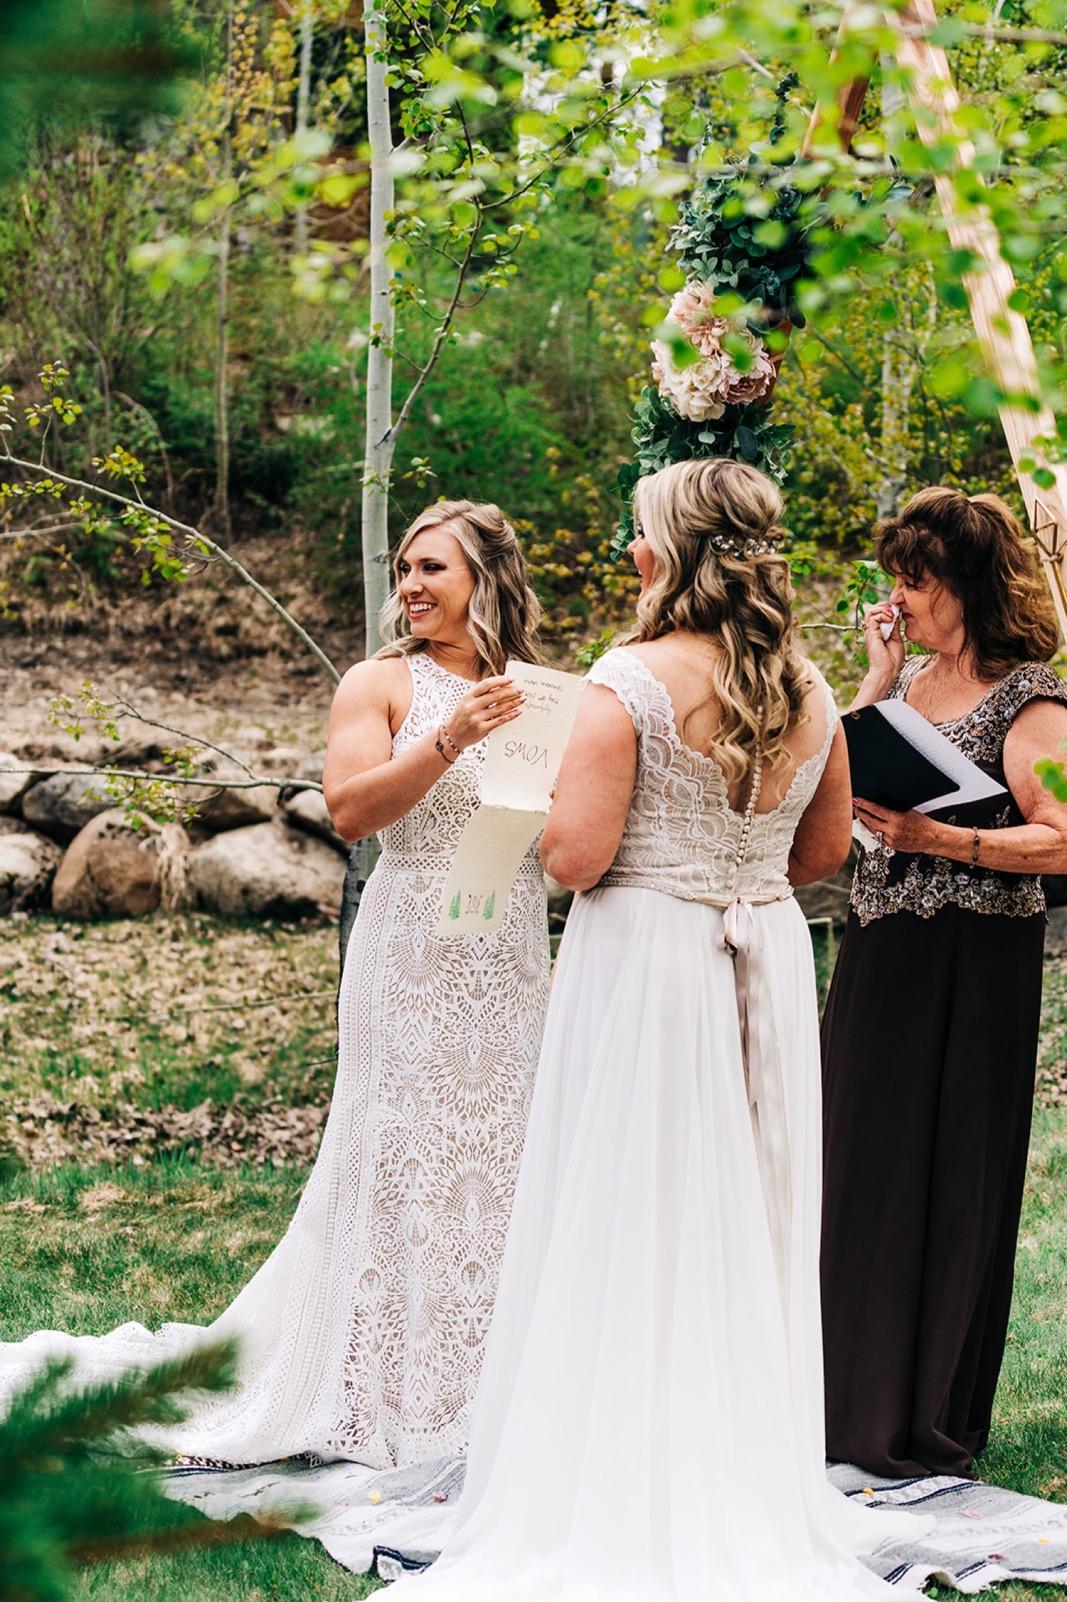 068_falissa_heather_wedding-175.jpg